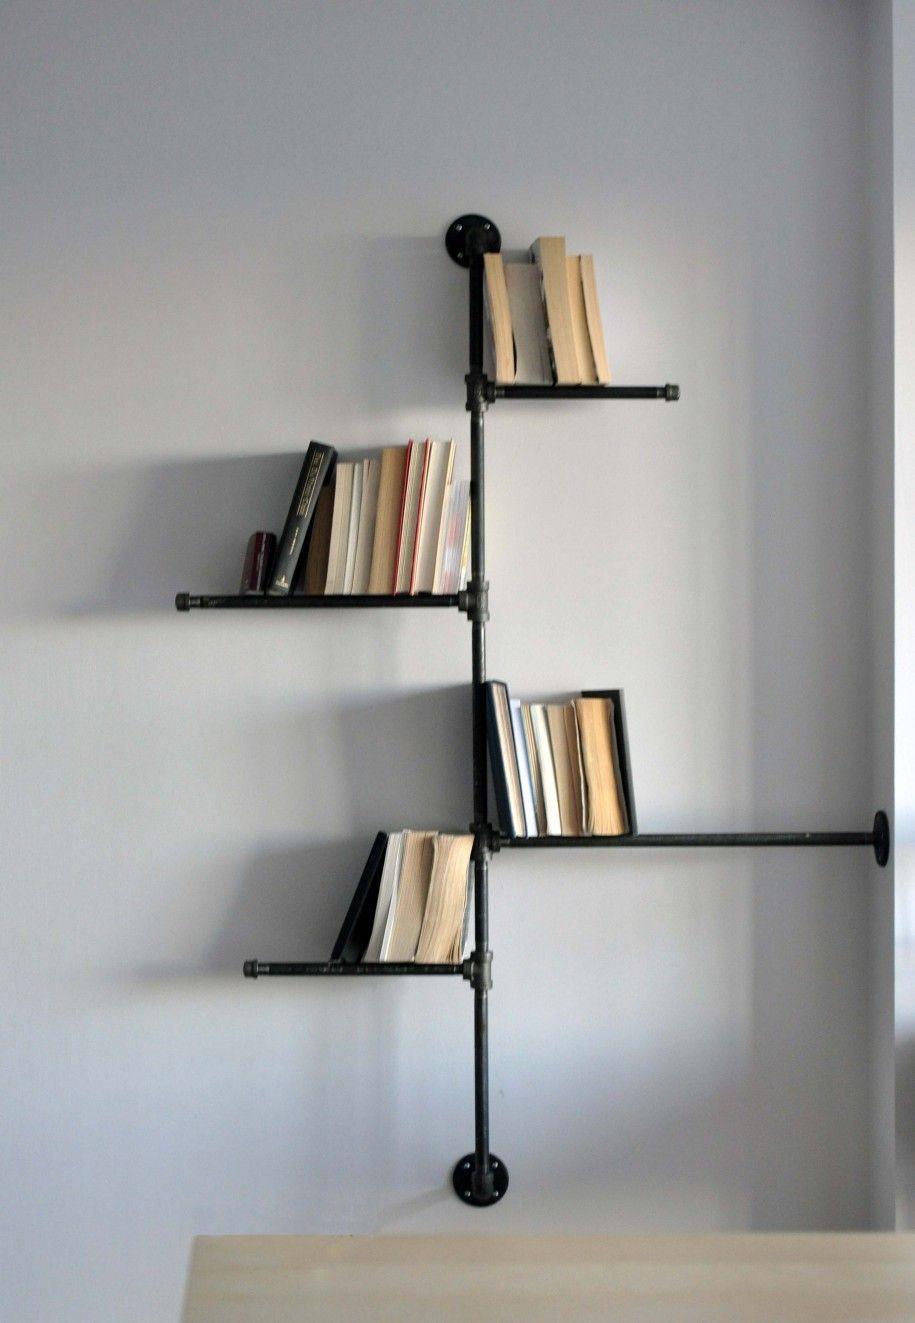 Image Result For Studio 350 Metal White Leaning Shelf 23 Inches Wide 62 Inches High Bucherregal Selber Bauen Zuhause Bucherregal Ideen